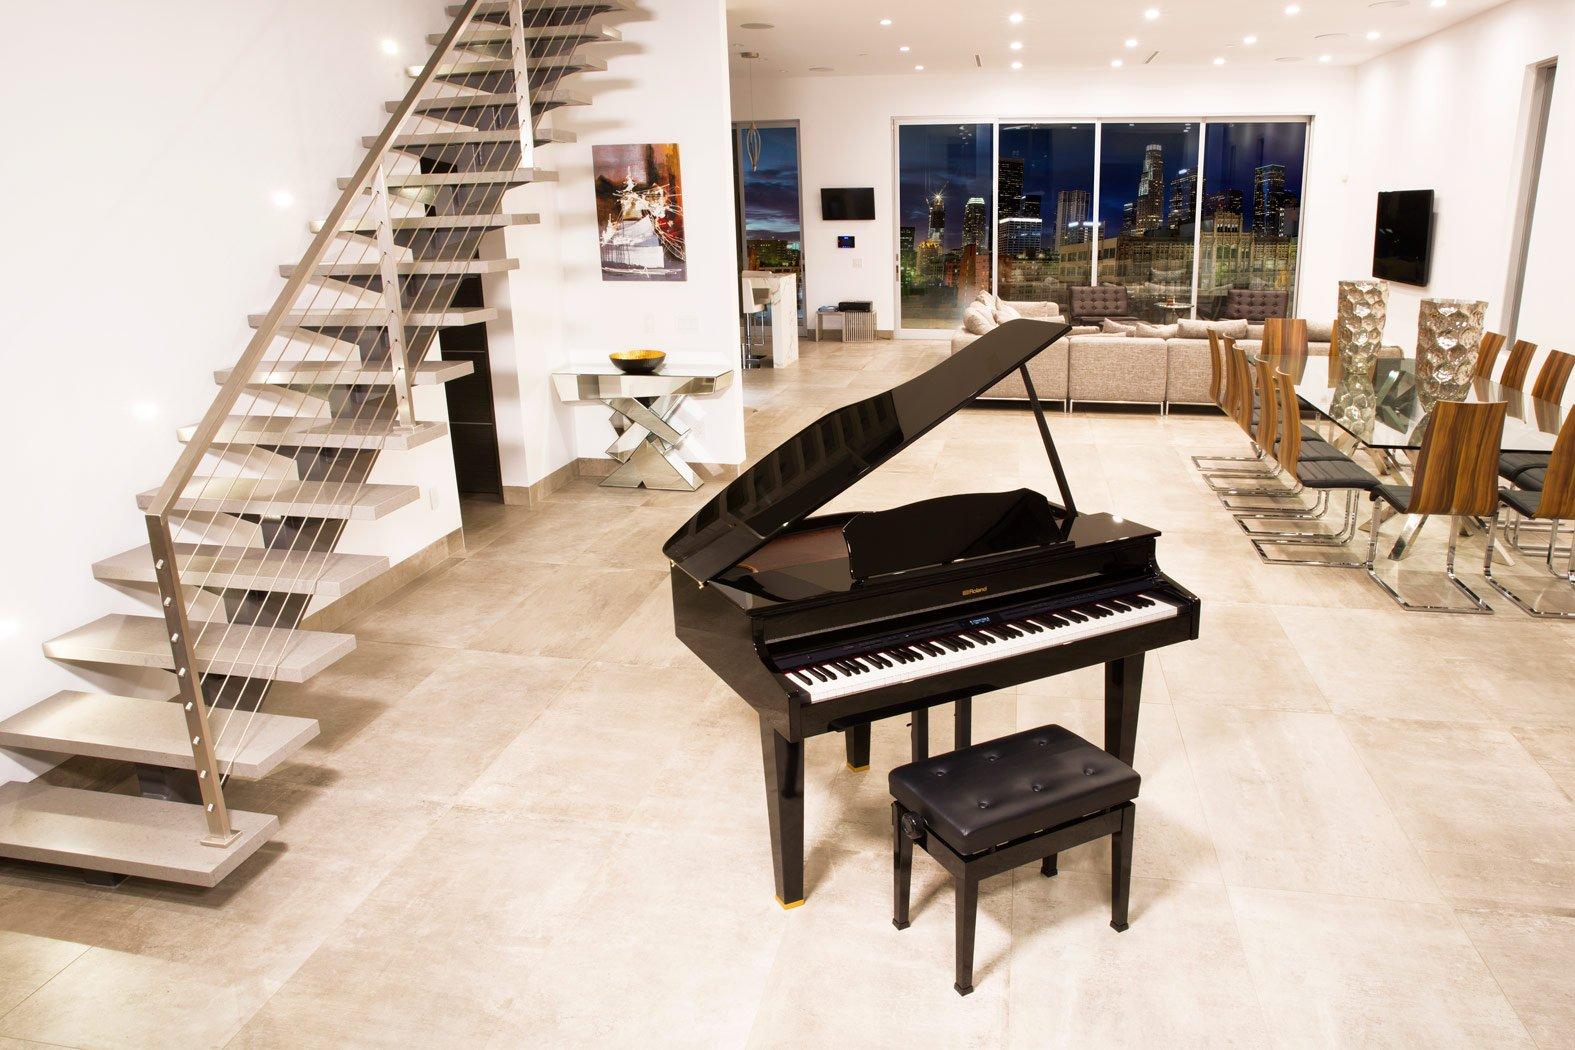 Digital Piano in San Mateo, CA - World Class Pianos